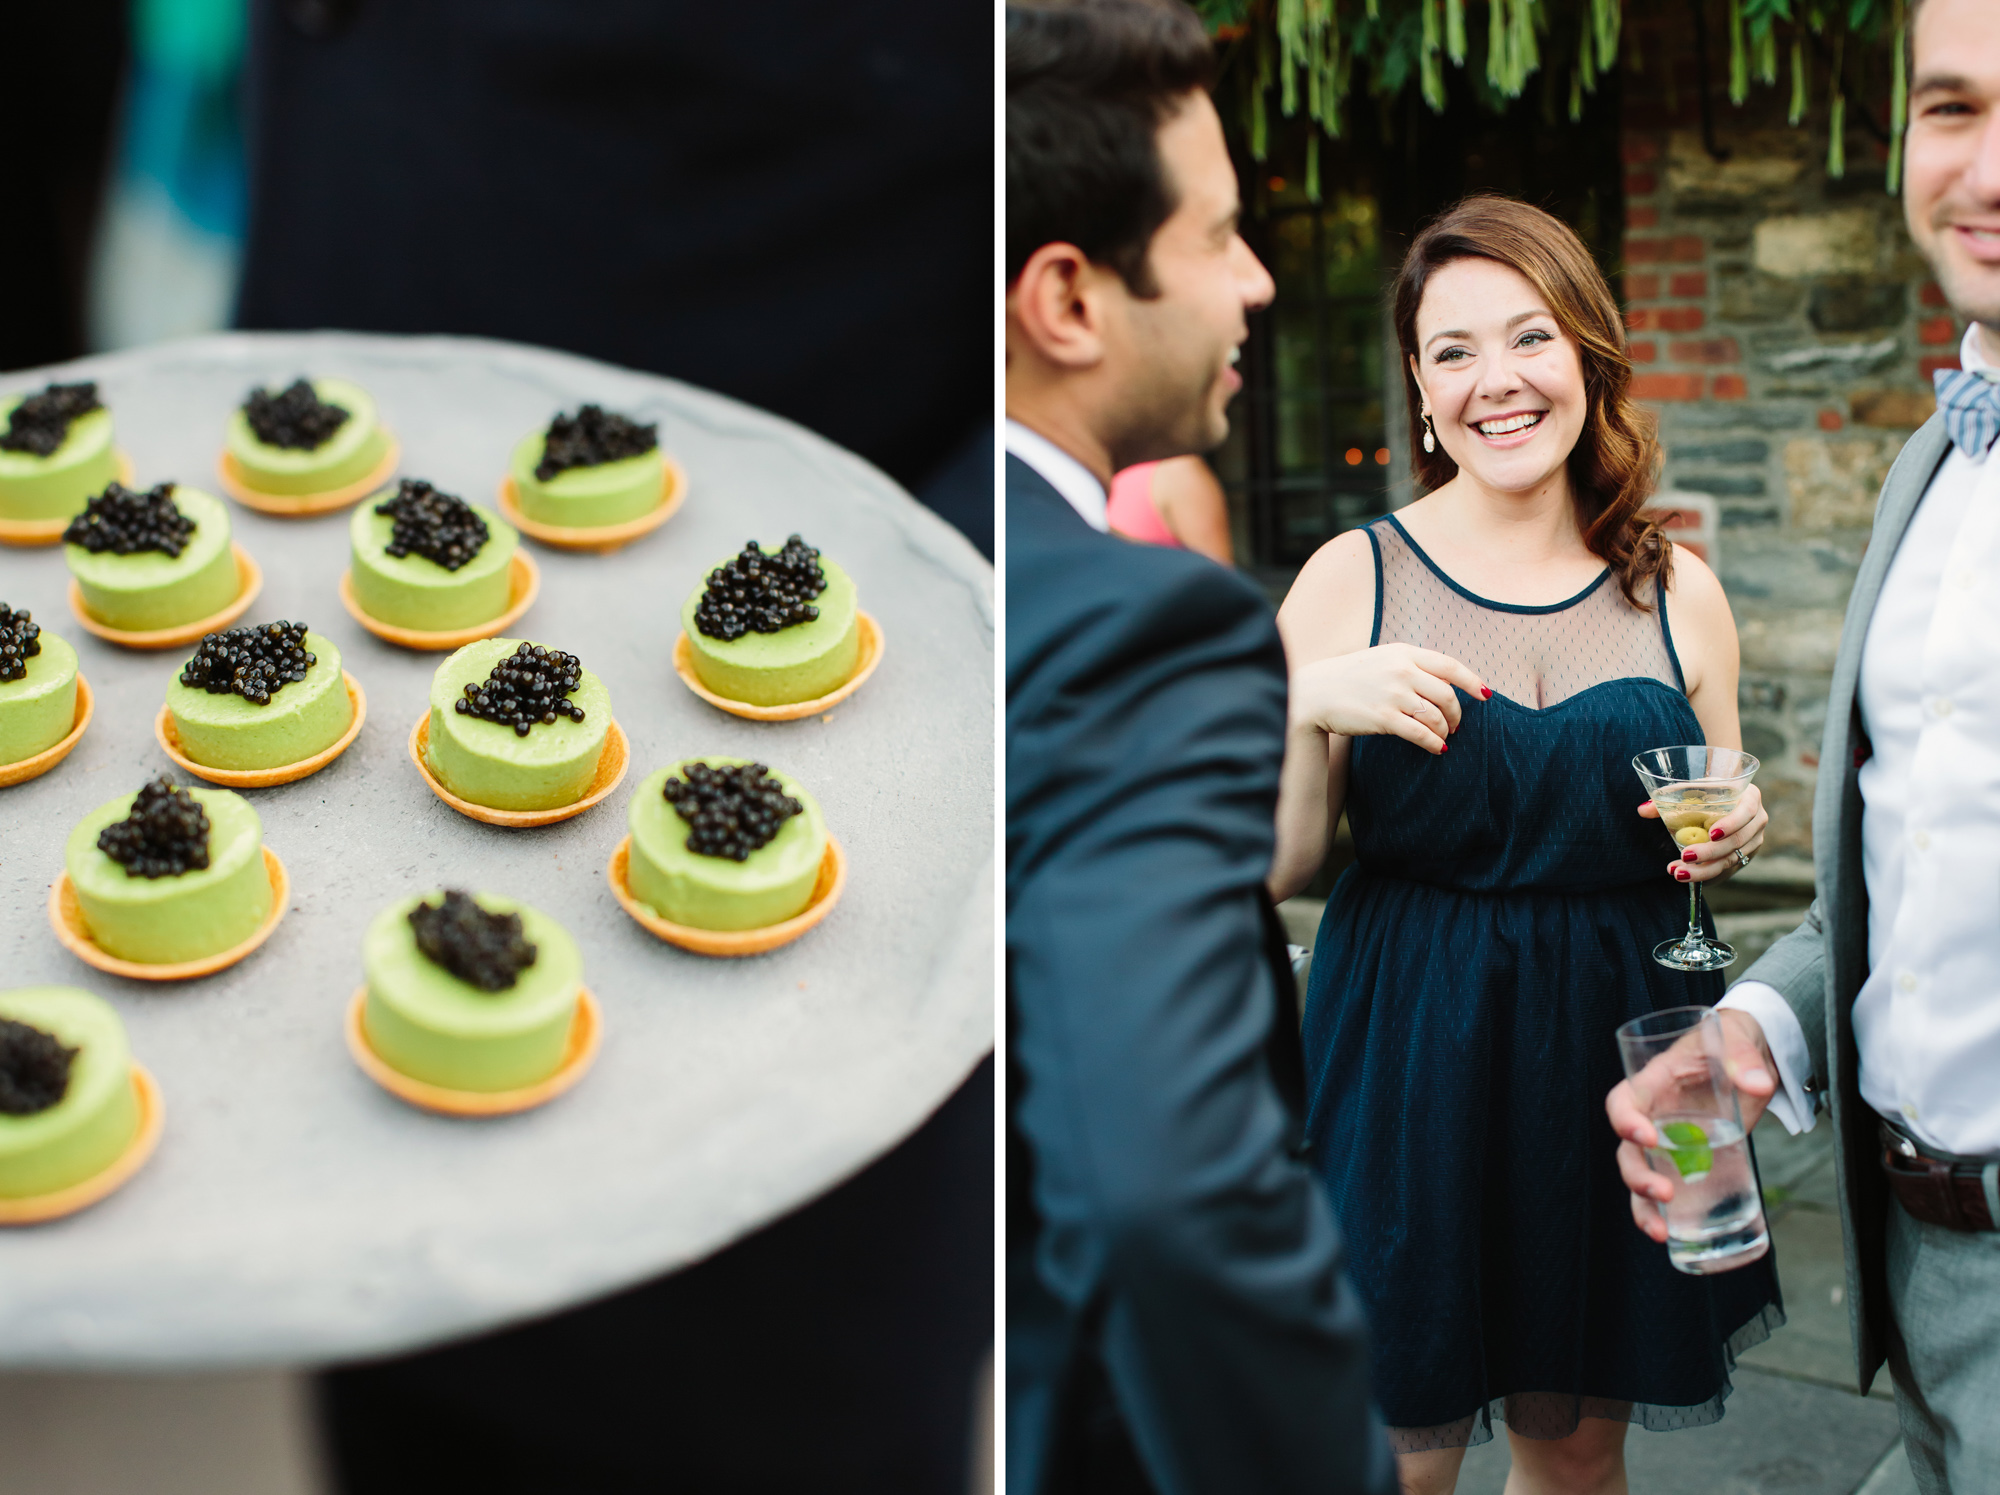 52_Jessica_Ted_Blue_Hill_Stone_Barns_Wedding_Pocantico_NY_Tanya_Salazar_Photography.jpg